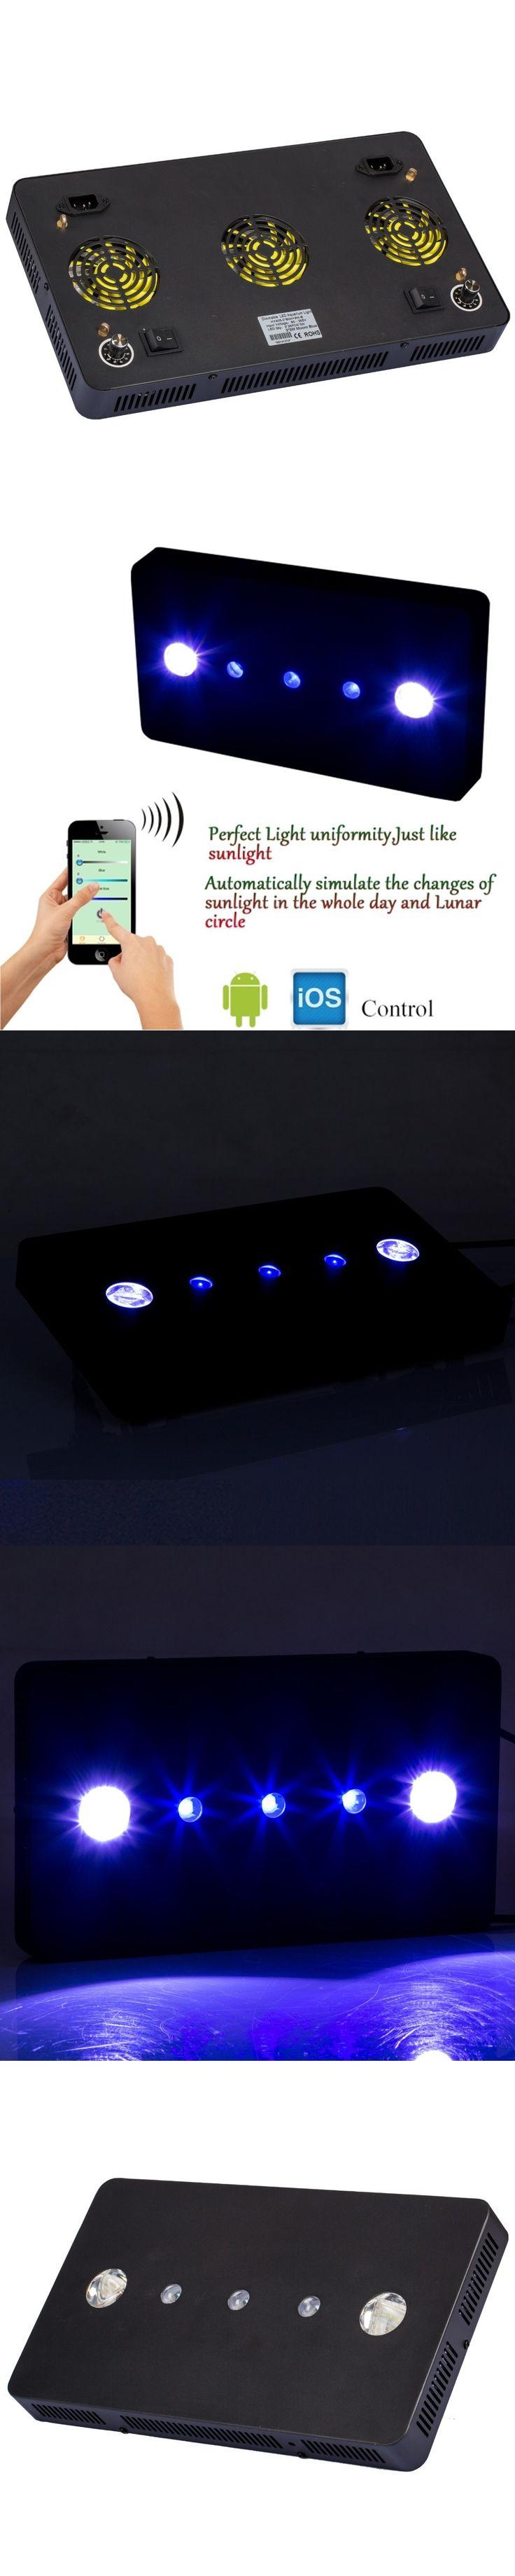 WIFI 169w LED aquarium light Dimmable Full spectrum aquarium led lighting for reef coral fish tank moonlight Lamp